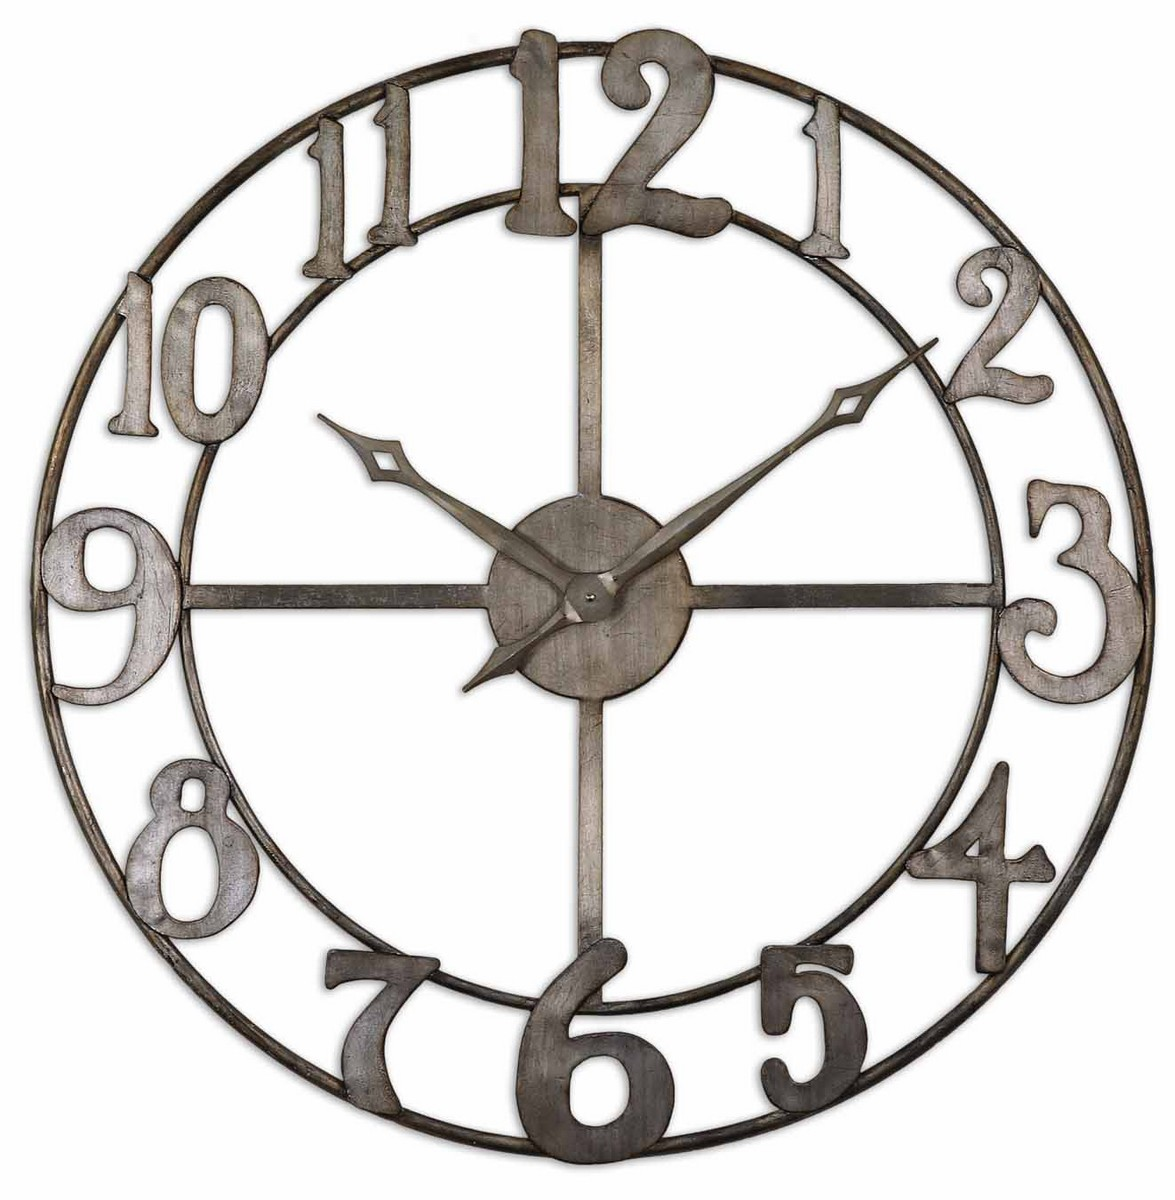 Uttermost Delevan 32 Metal Wall Clock